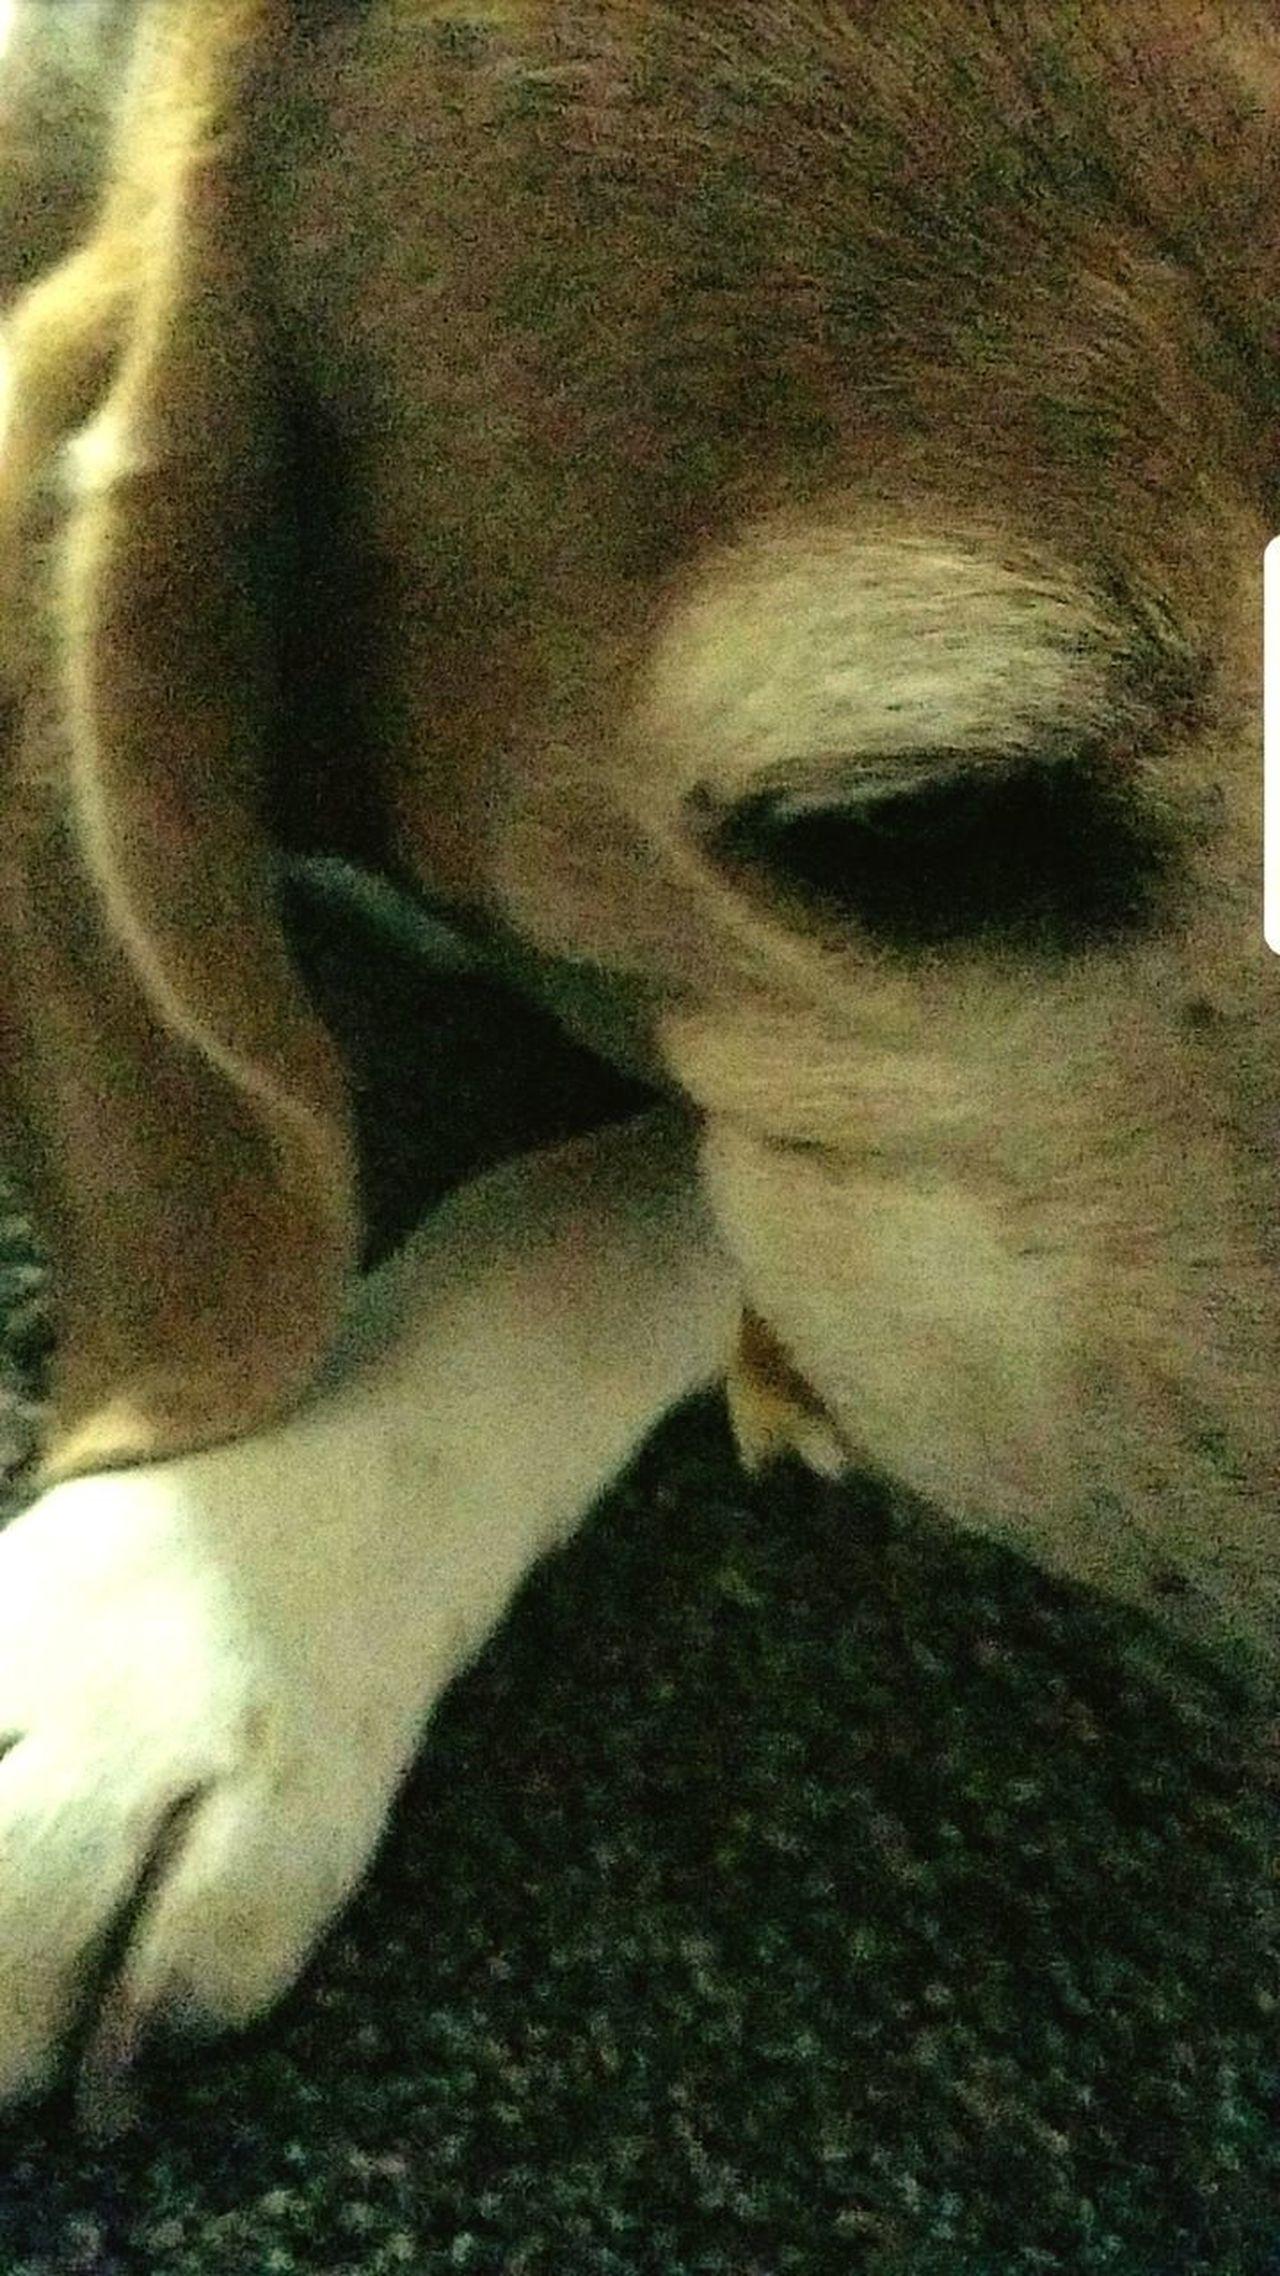 Beaglelife Beagle Love Dogs Of EyeEm Dog Portrait Beagle Dog Dog❤ Dog Love Beagles  Beaglelovers Beagles